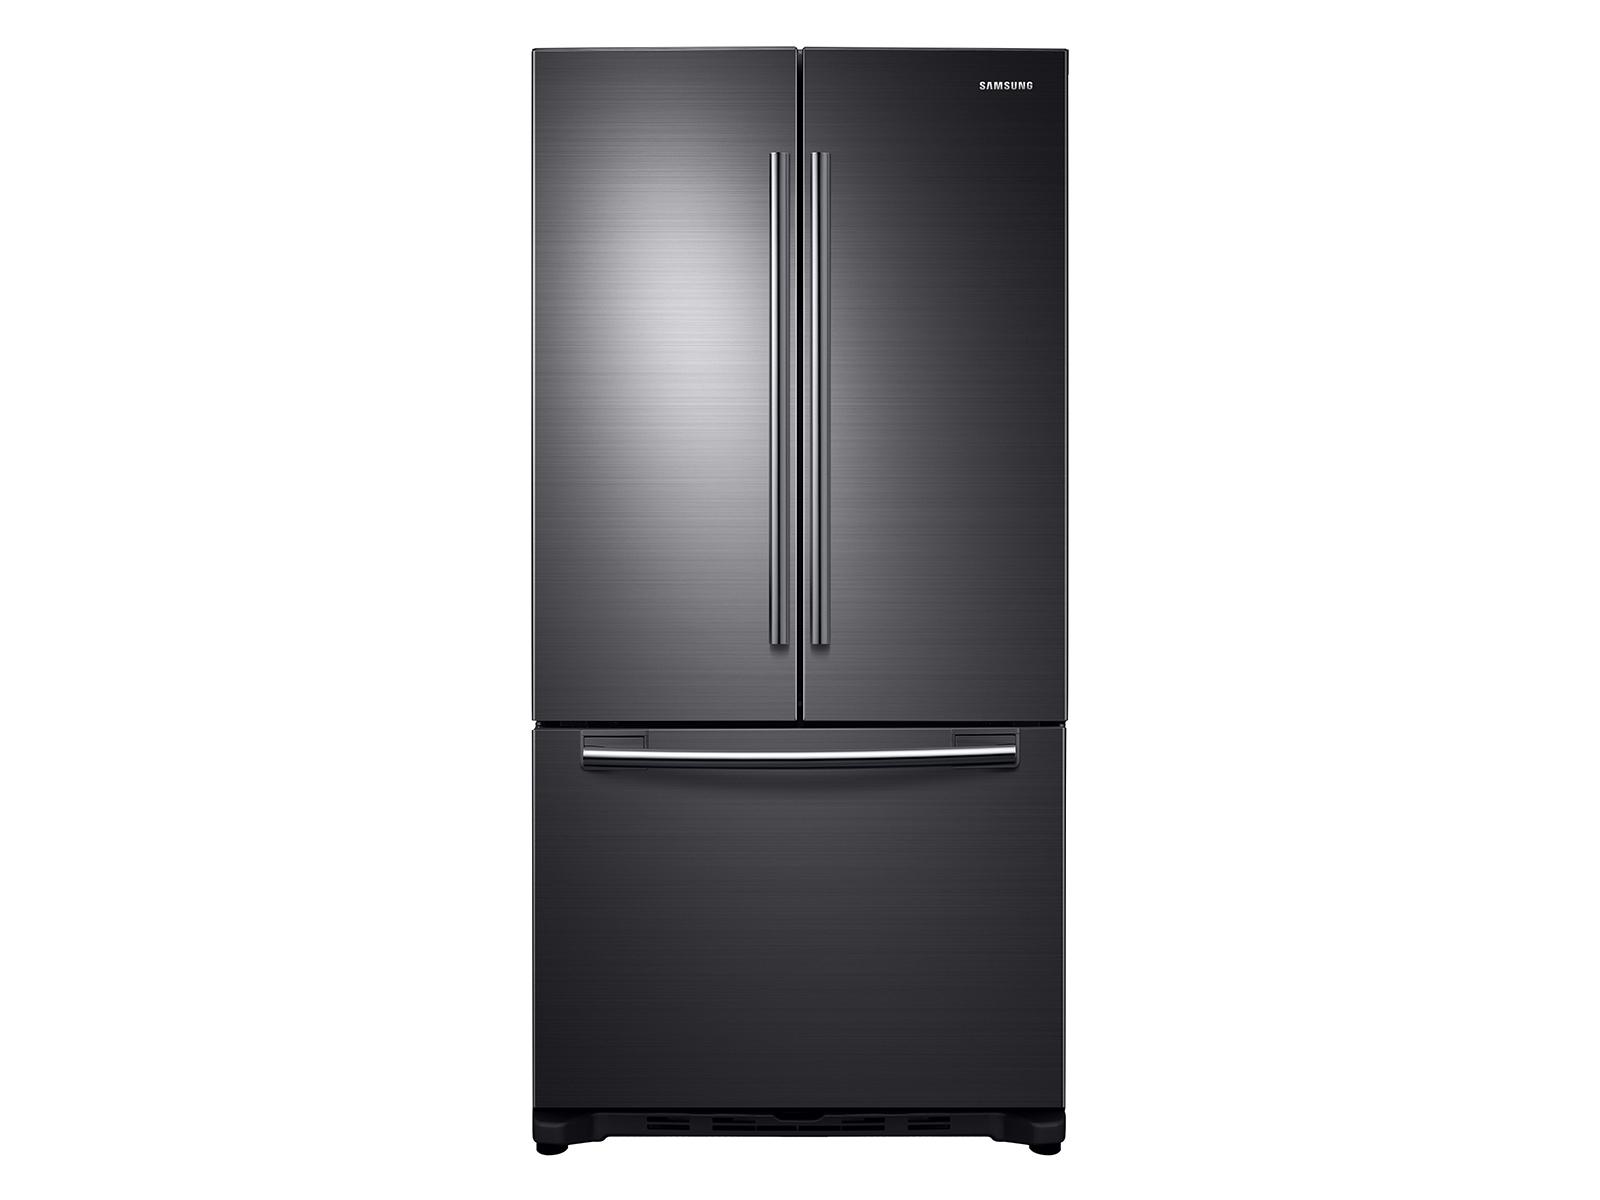 Samsung 18 cu. ft. Counter Depth French Door Refrigerator in Black Stainless Steel, Fingerprint Resistant Black Stainless Steel